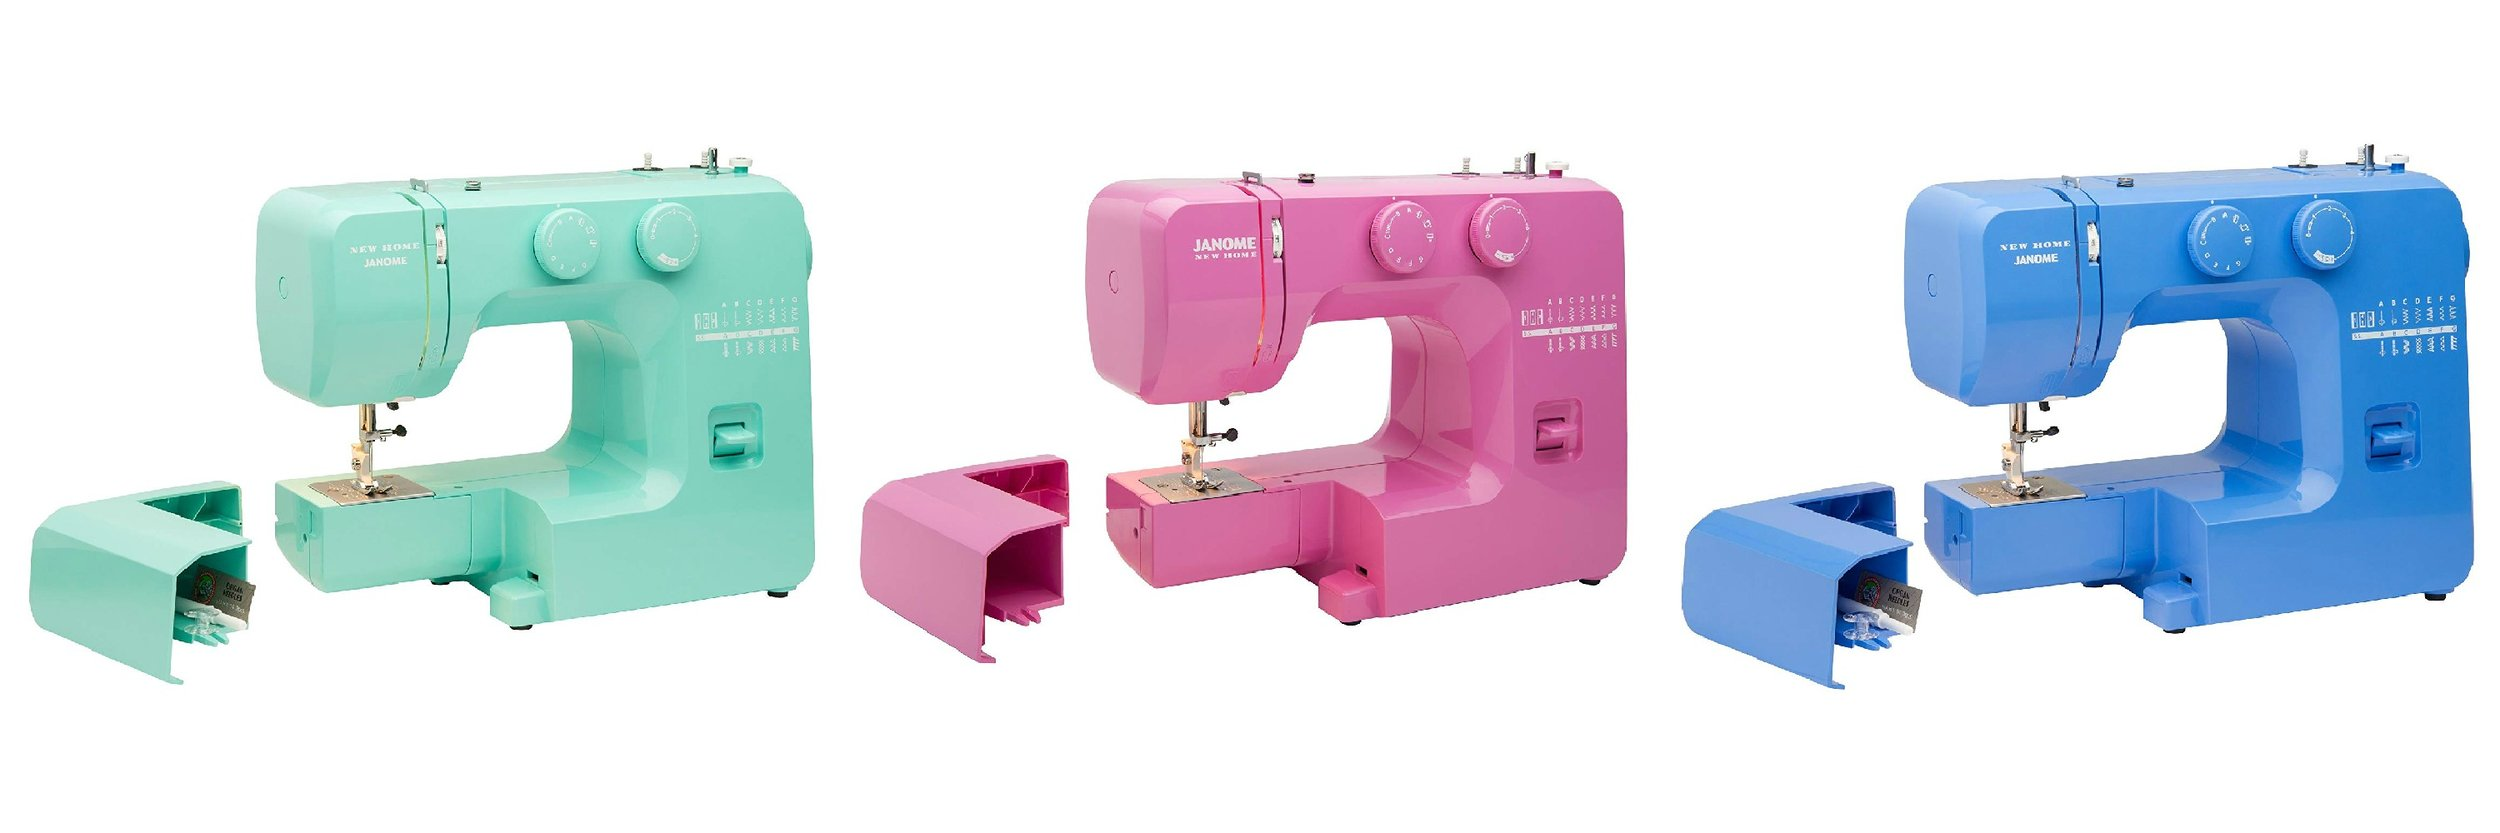 Janome Sewing Machine Collage.jpg